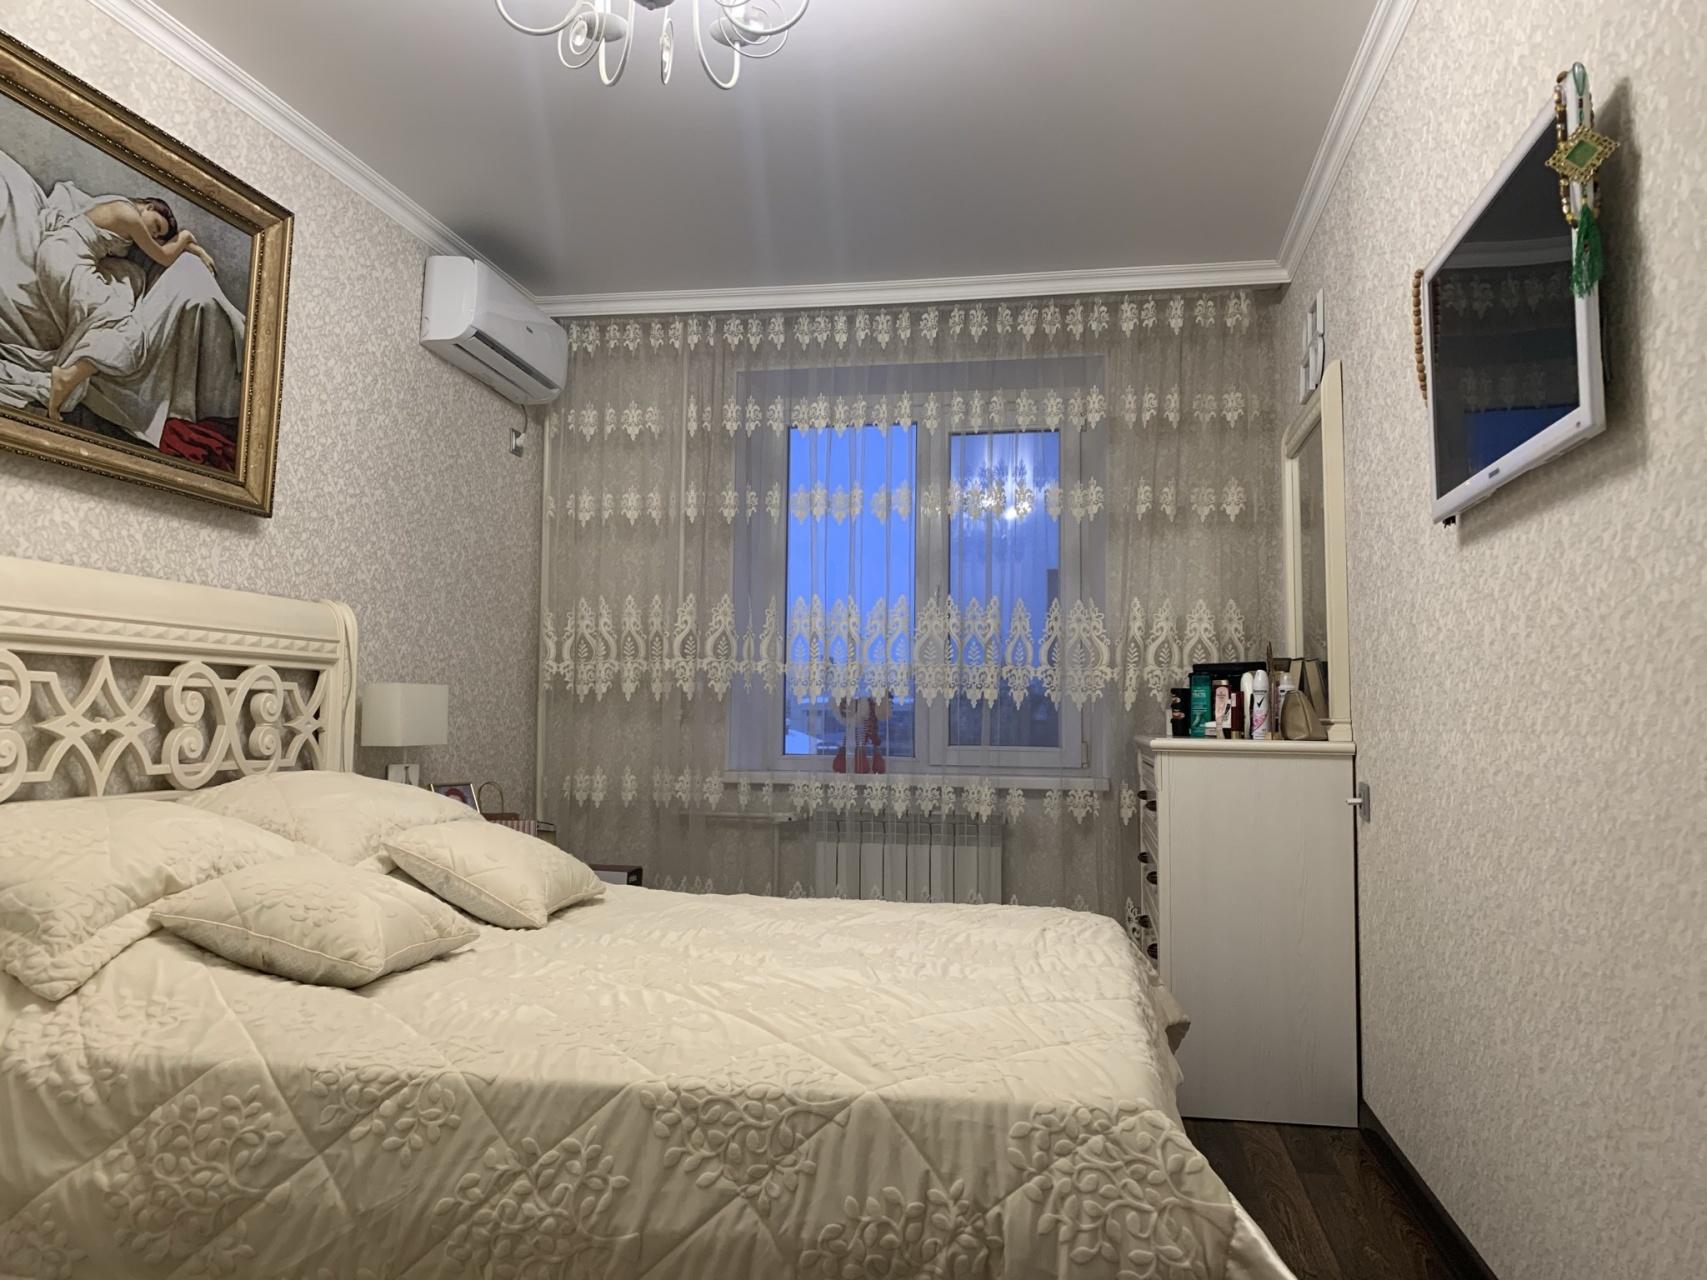 Квартира 3 комнатная в г. Майкоп район Черемушки